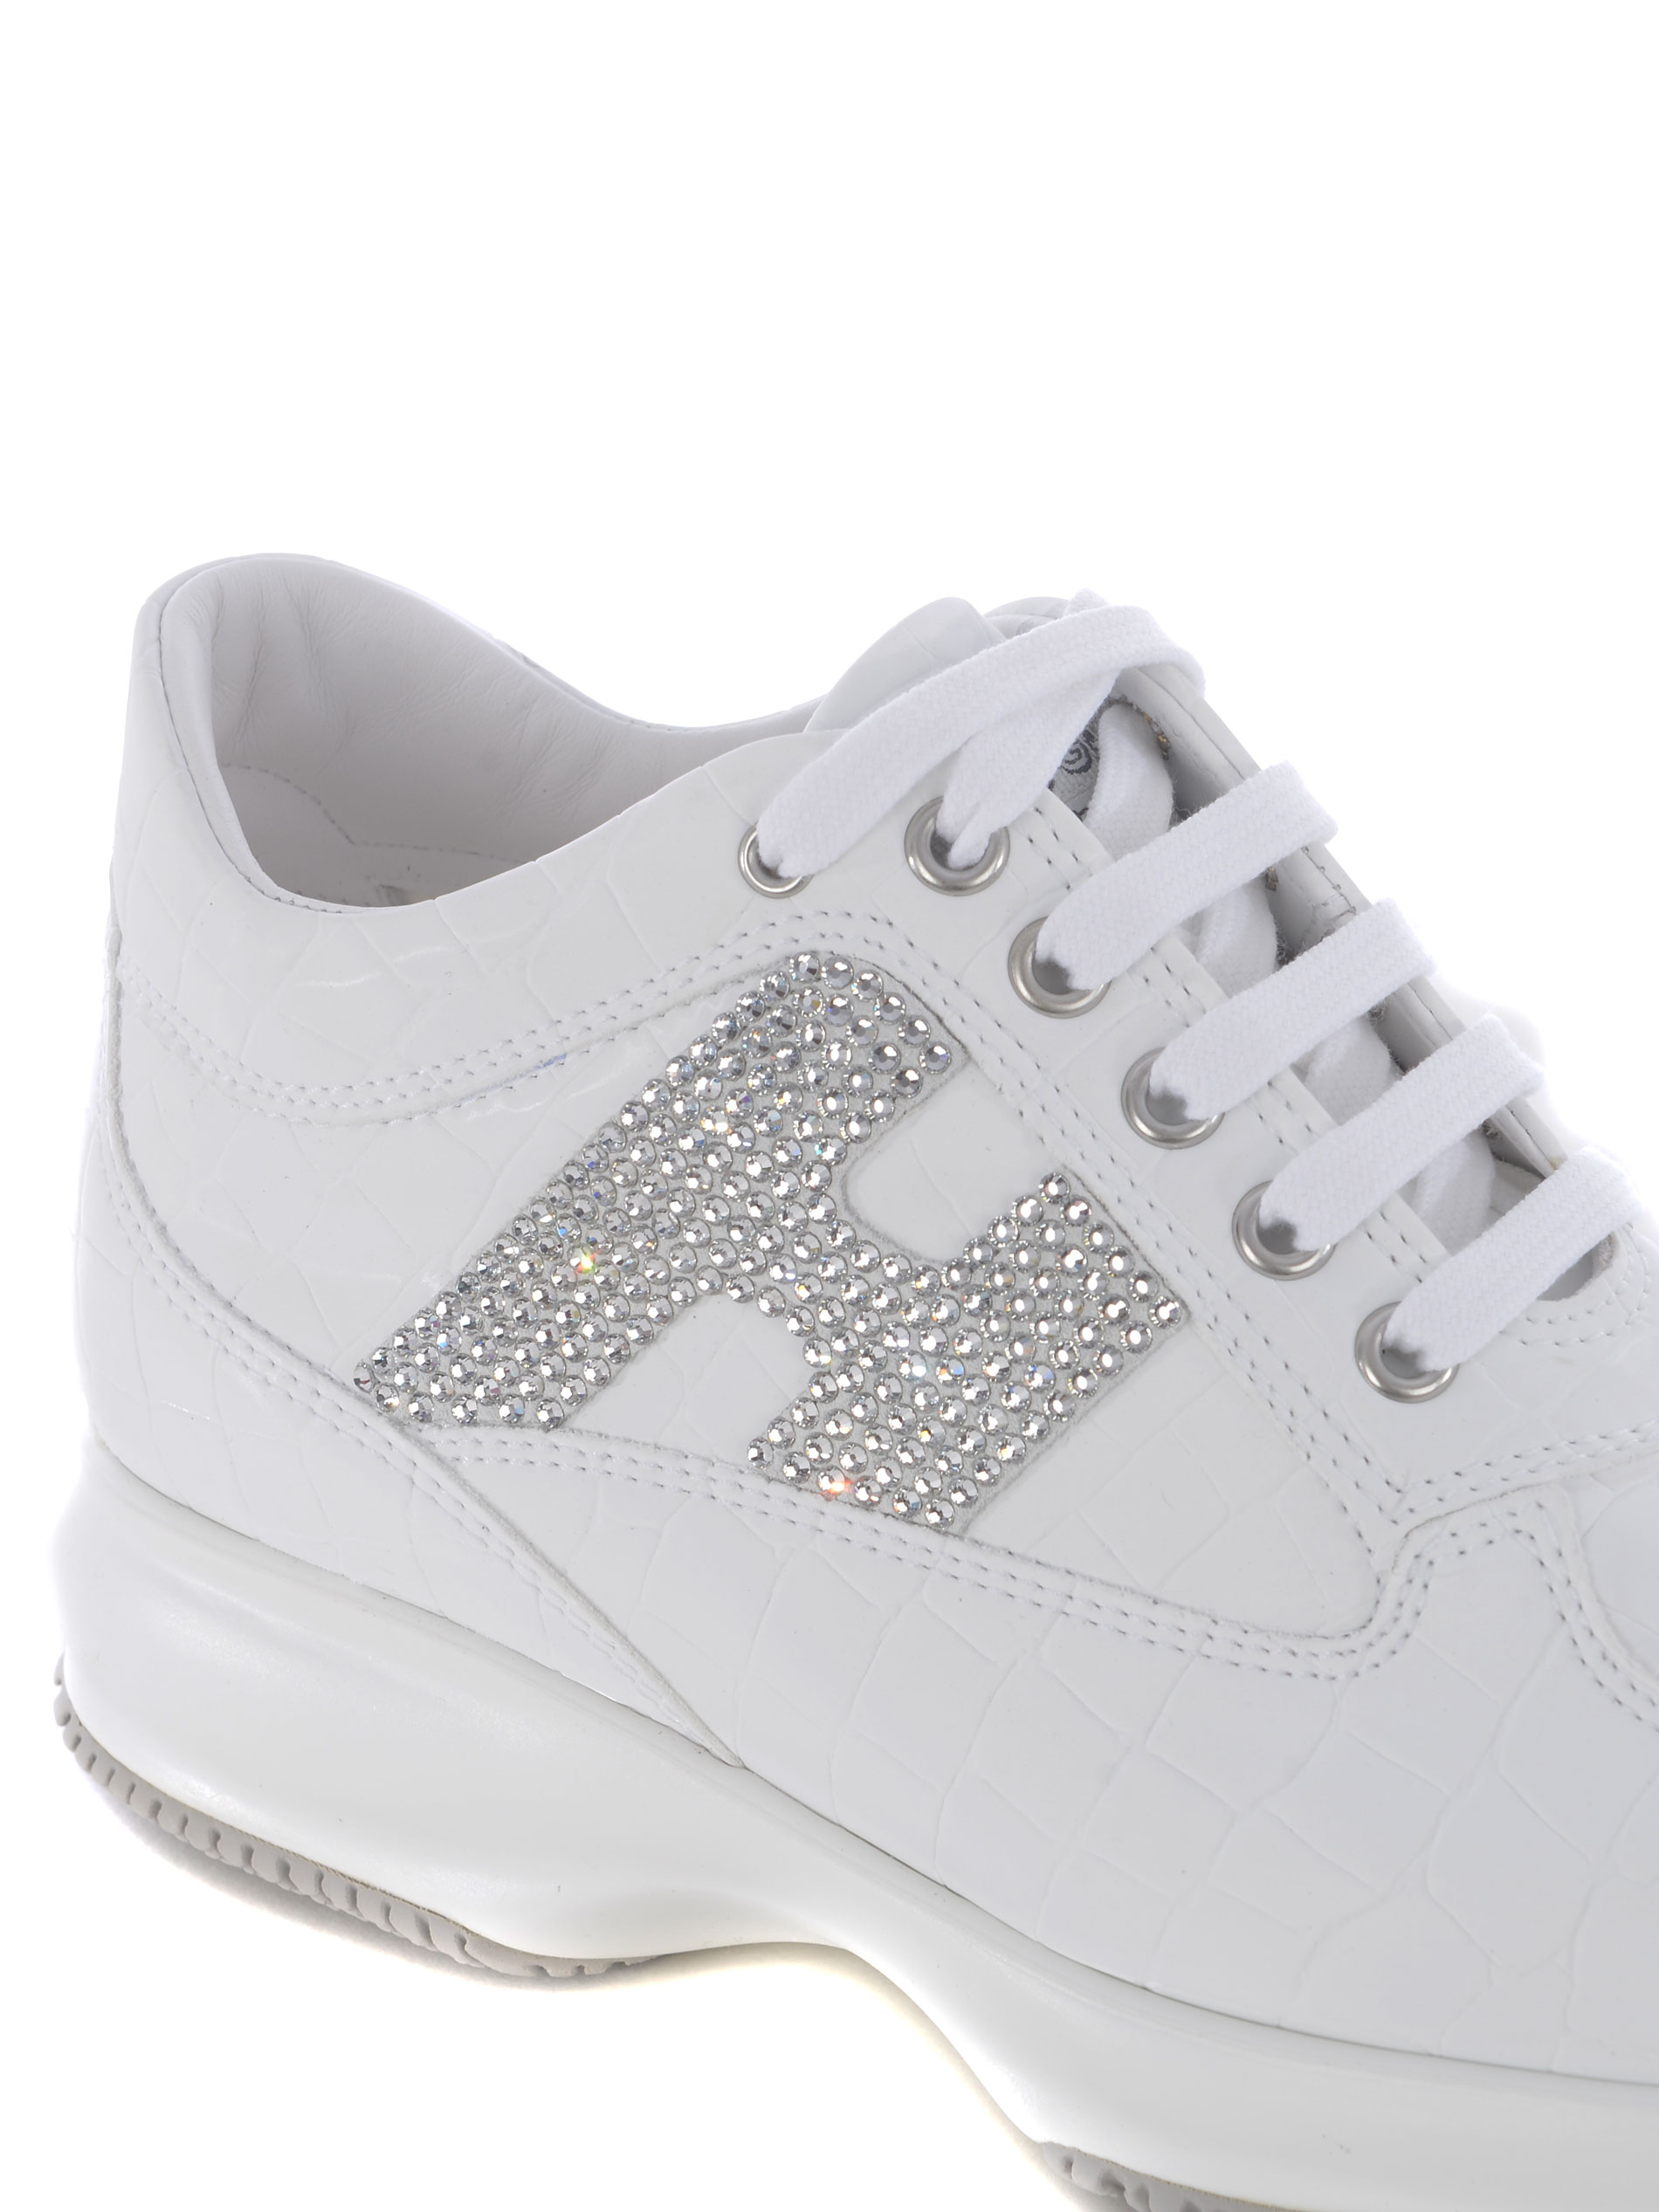 Sneakers donna Hogan Interactive in pelle